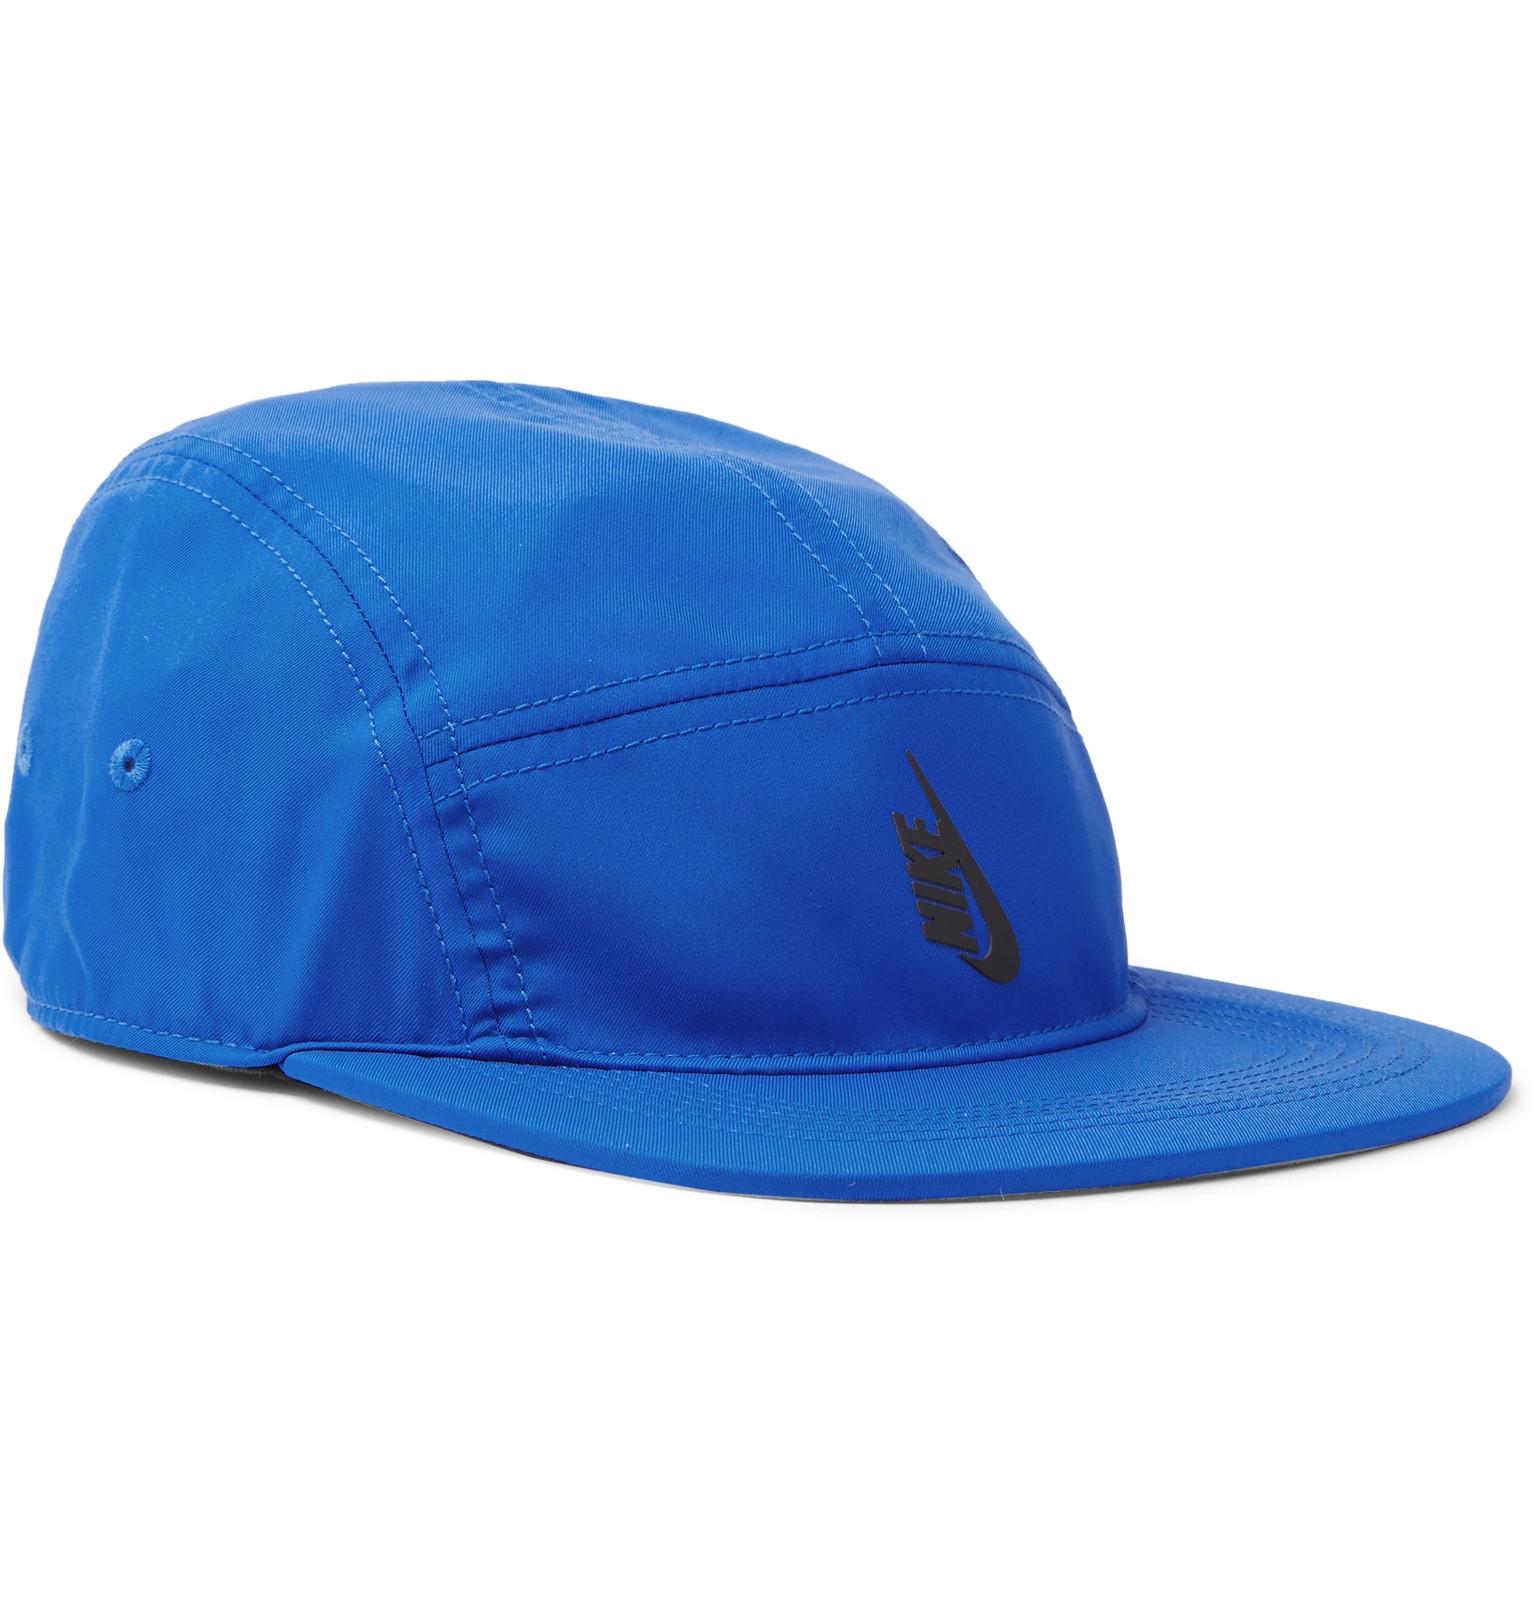 Nike - NikeLab Dri-FIT Baseball Cap 8cf1ff4e8a6